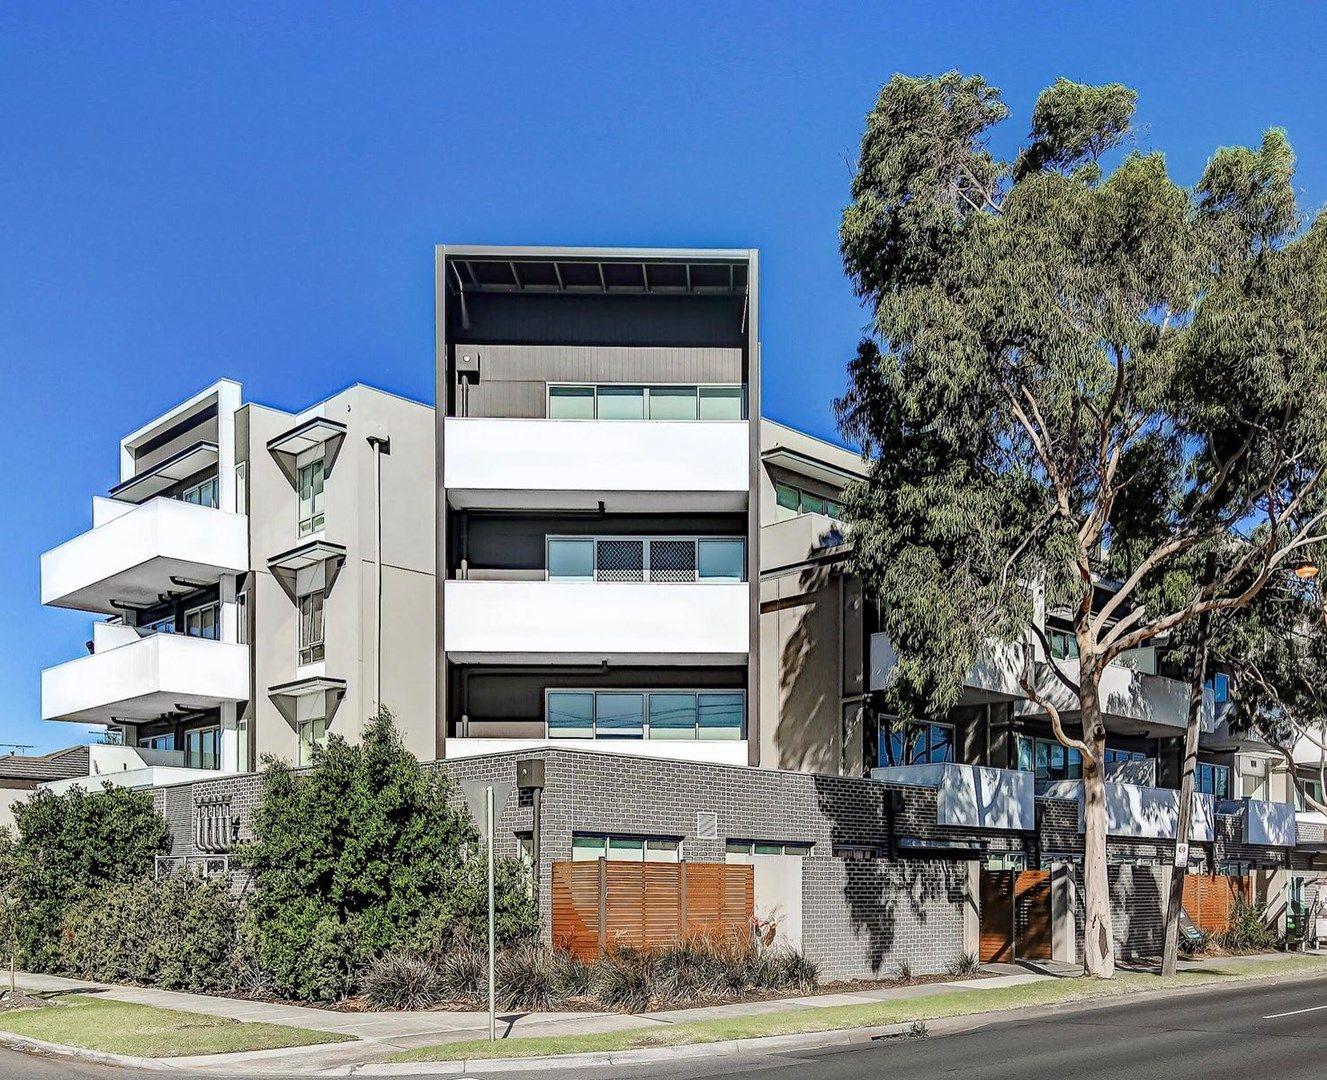 3/251 Ballarat Road, Braybrook VIC 3019, Image 0